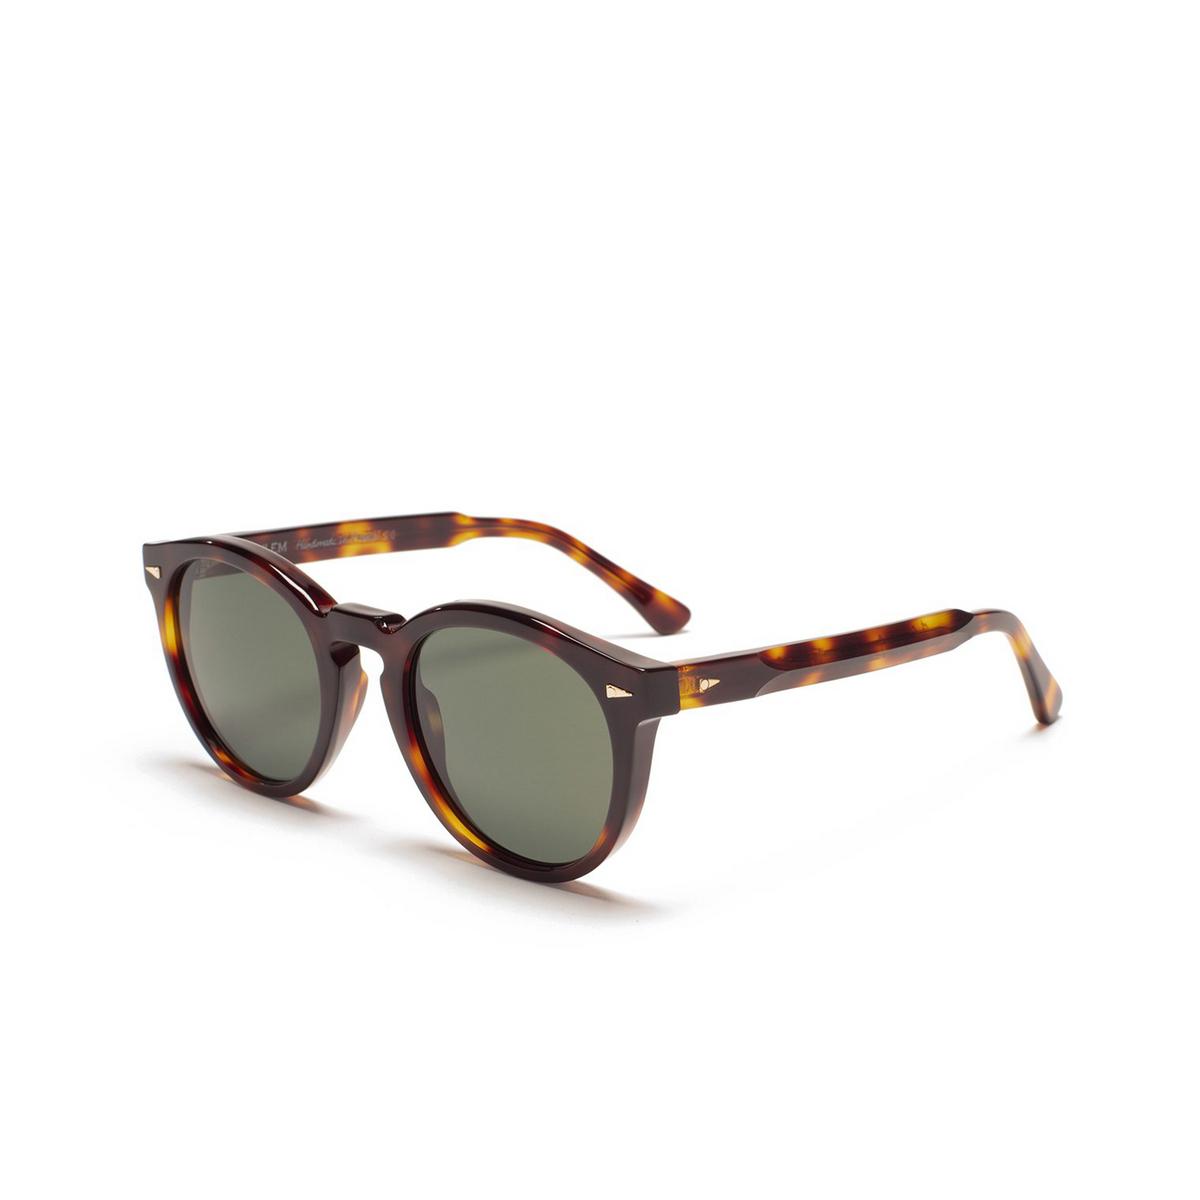 Ahlem® Round Sunglasses: St Germain color Classic Turtle.